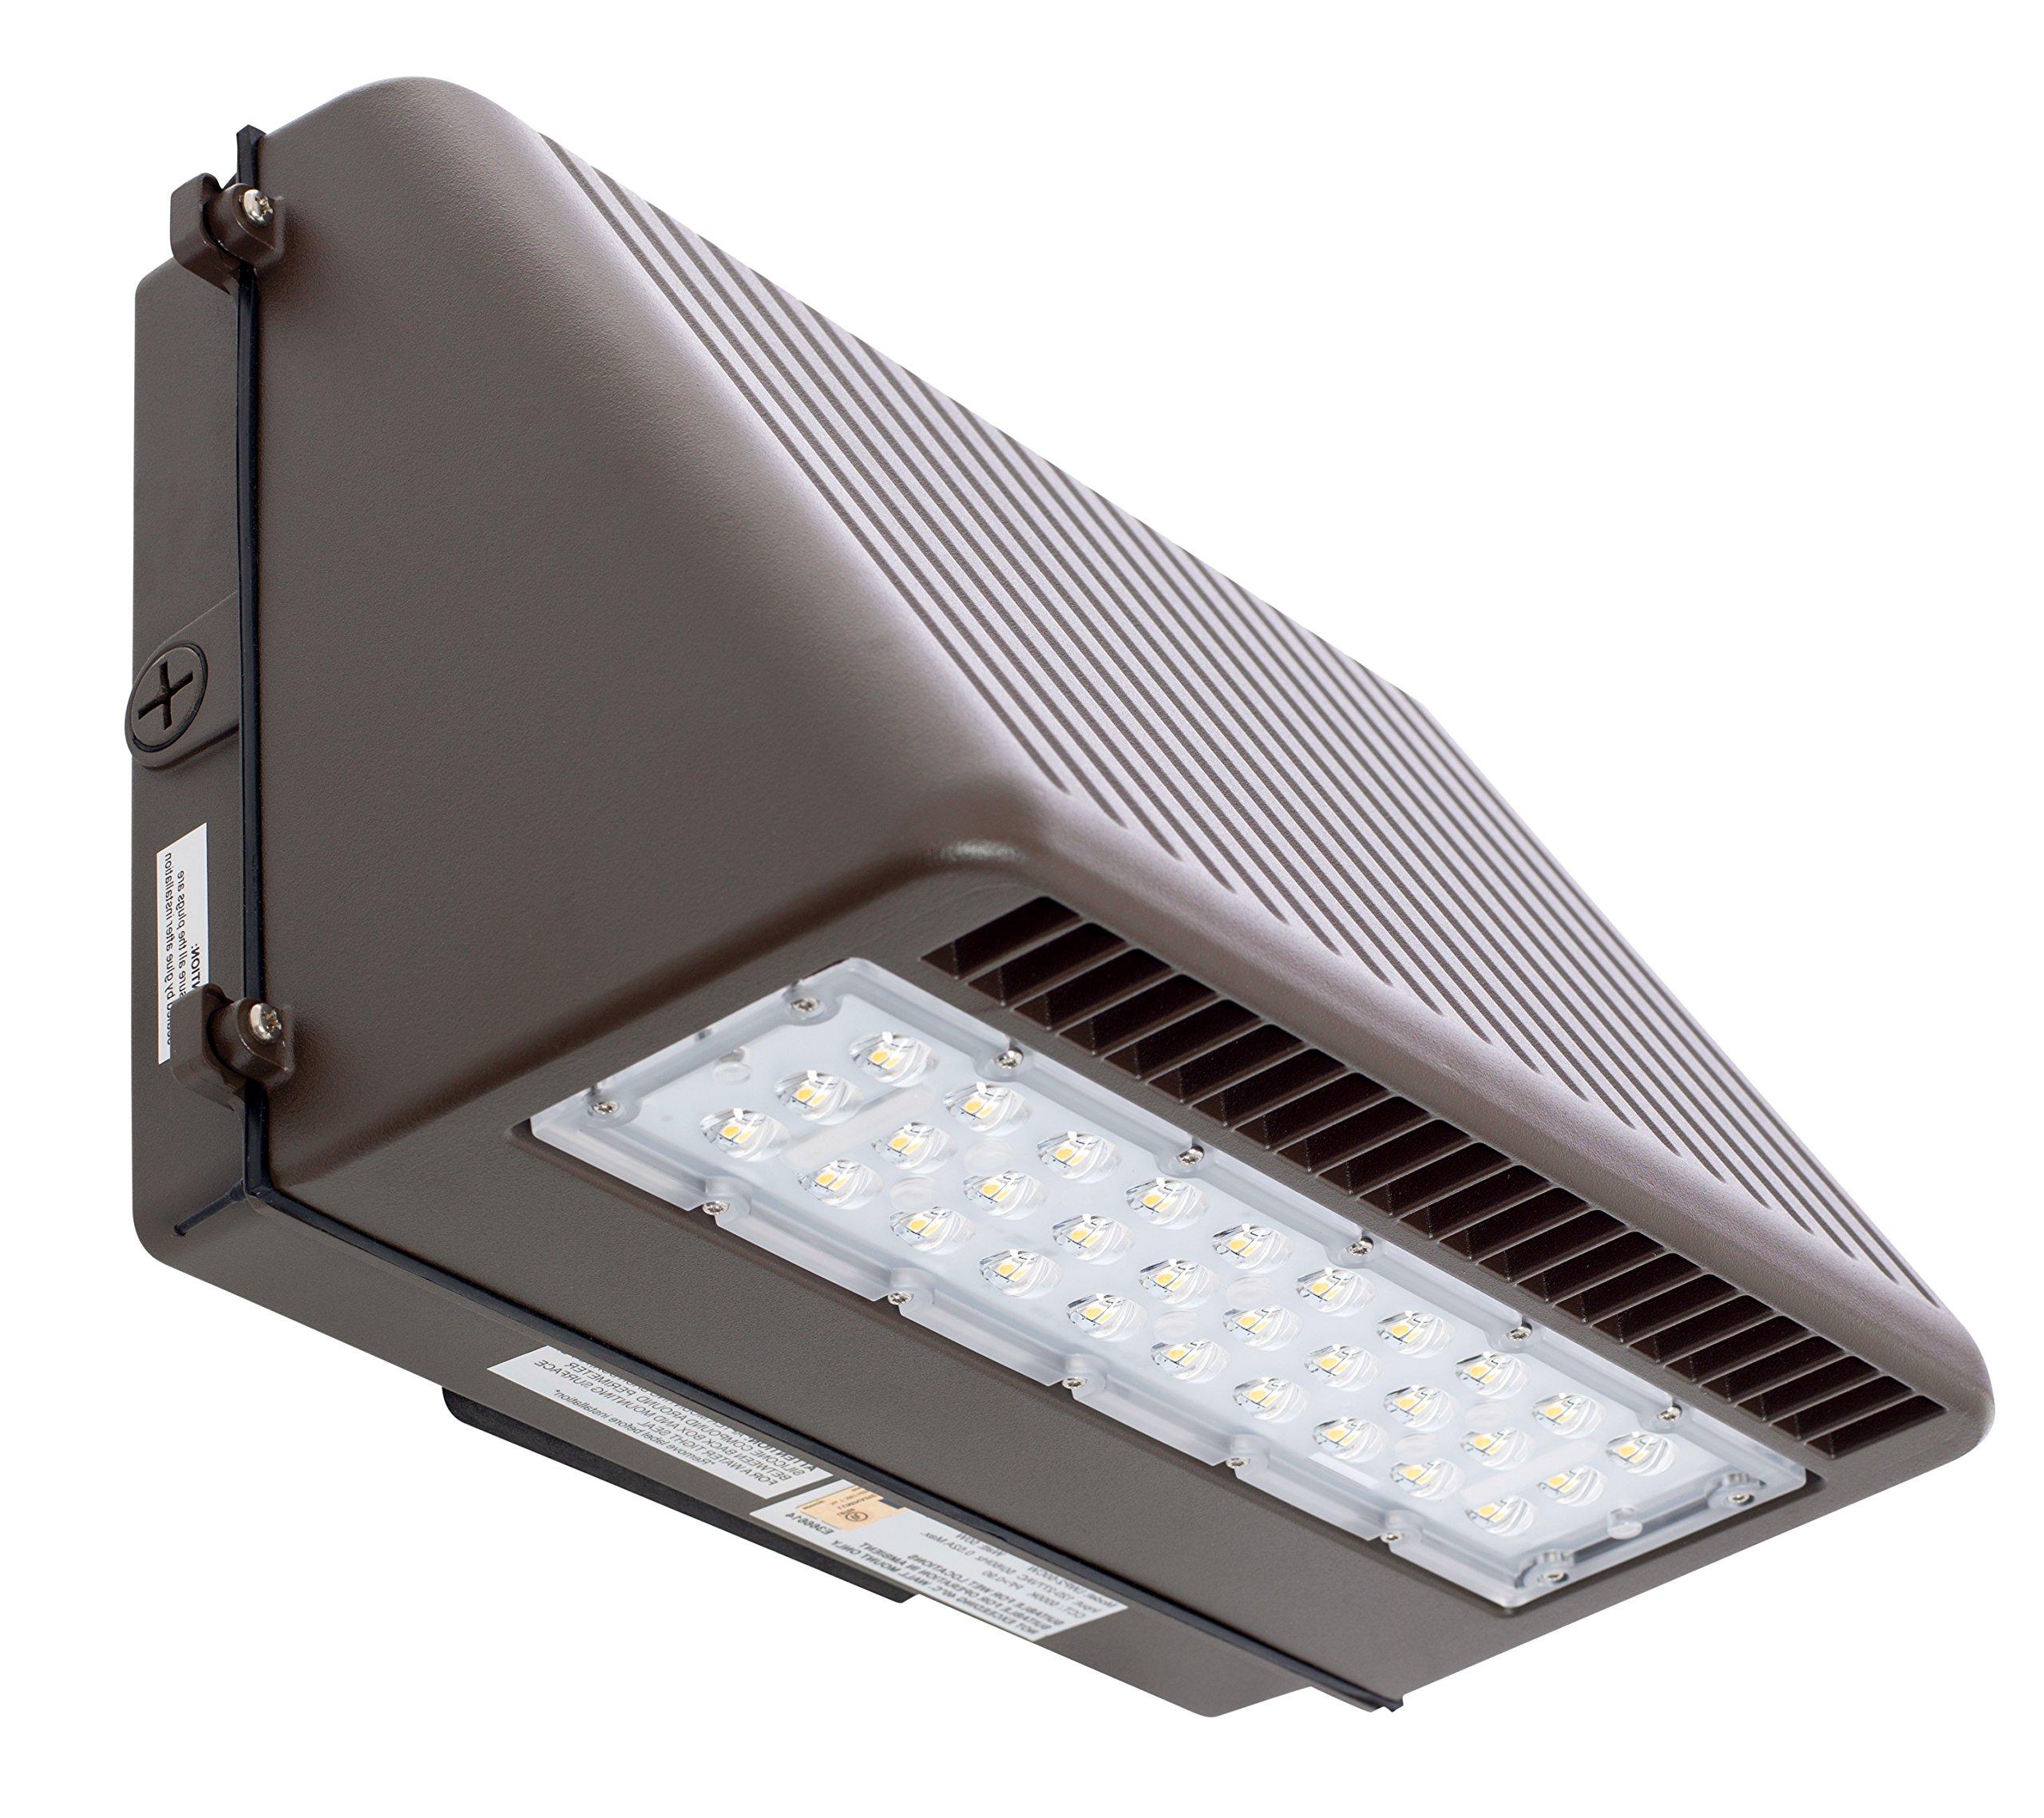 Westgate Lighting LED Wall Pack-Die Cast Aluminum Housing Full Cutoff LED Wall Pack-Wall Pack-Replaces HID Flood Lights-7 Year Warranty (50-Watts, 3000K Warm White)